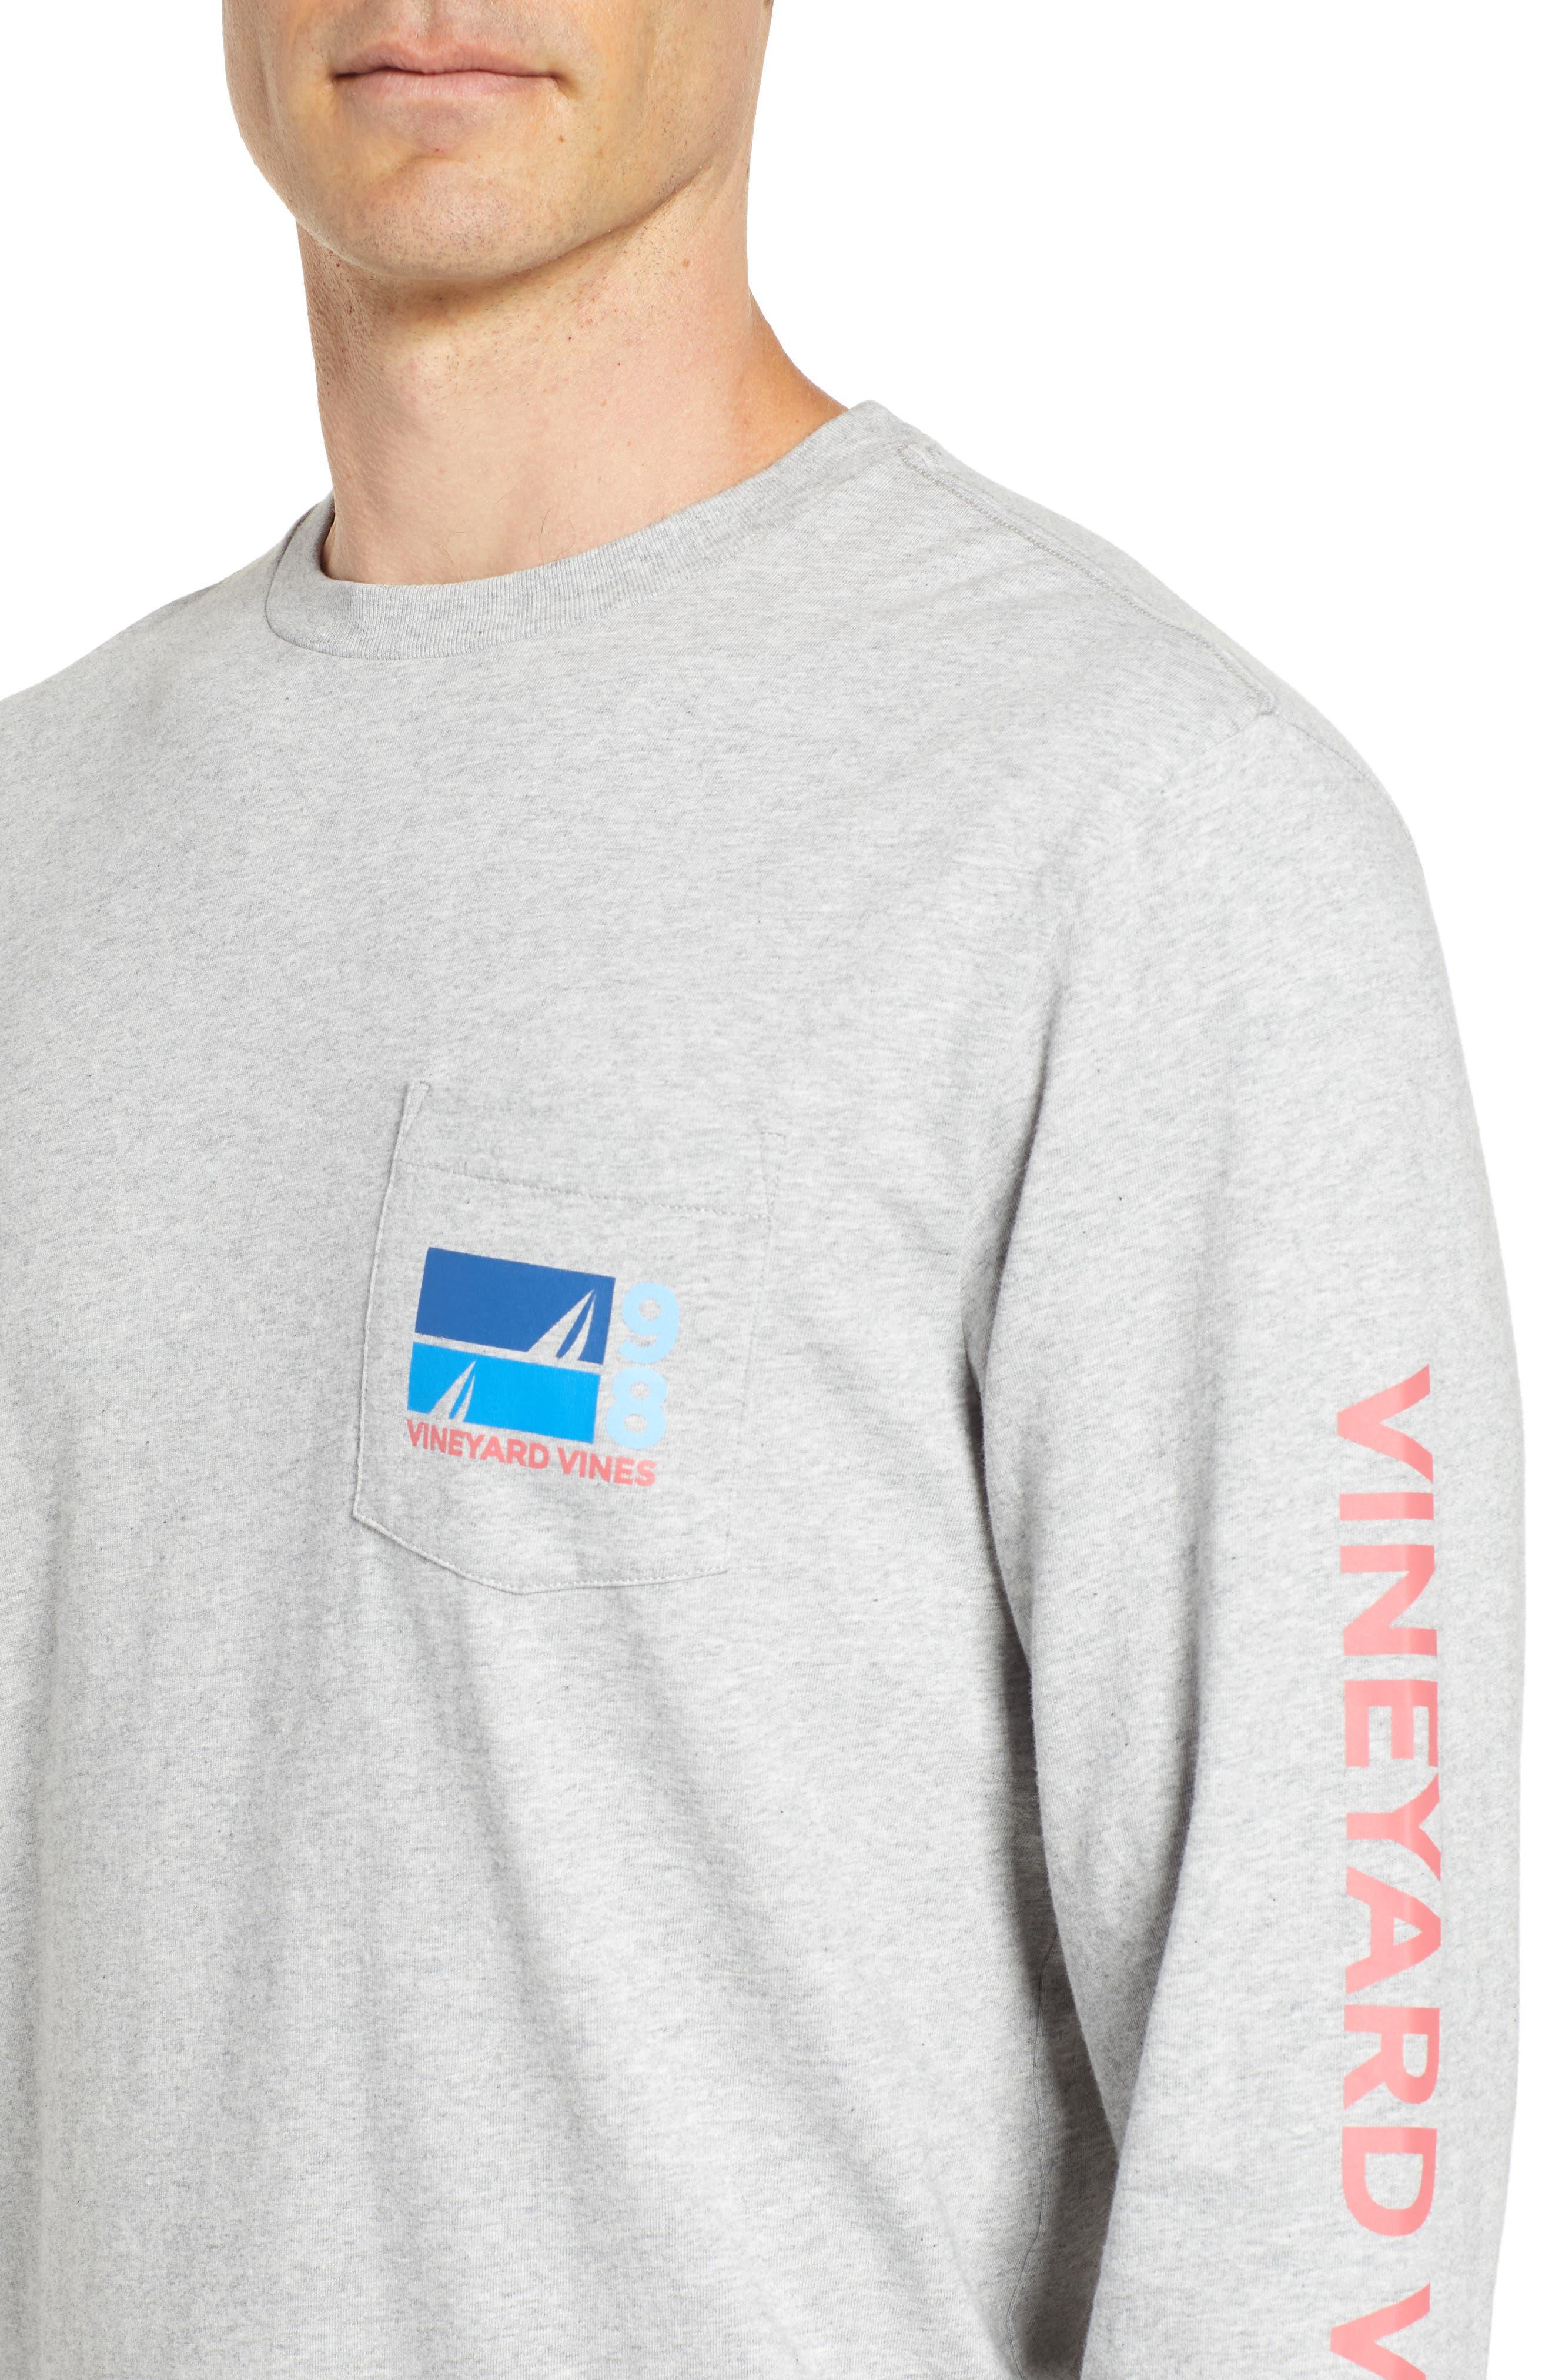 VINEYARD VINES,                             Sailing Blue Regular Fit Crewneck T-Shirt,                             Alternate thumbnail 4, color,                             039